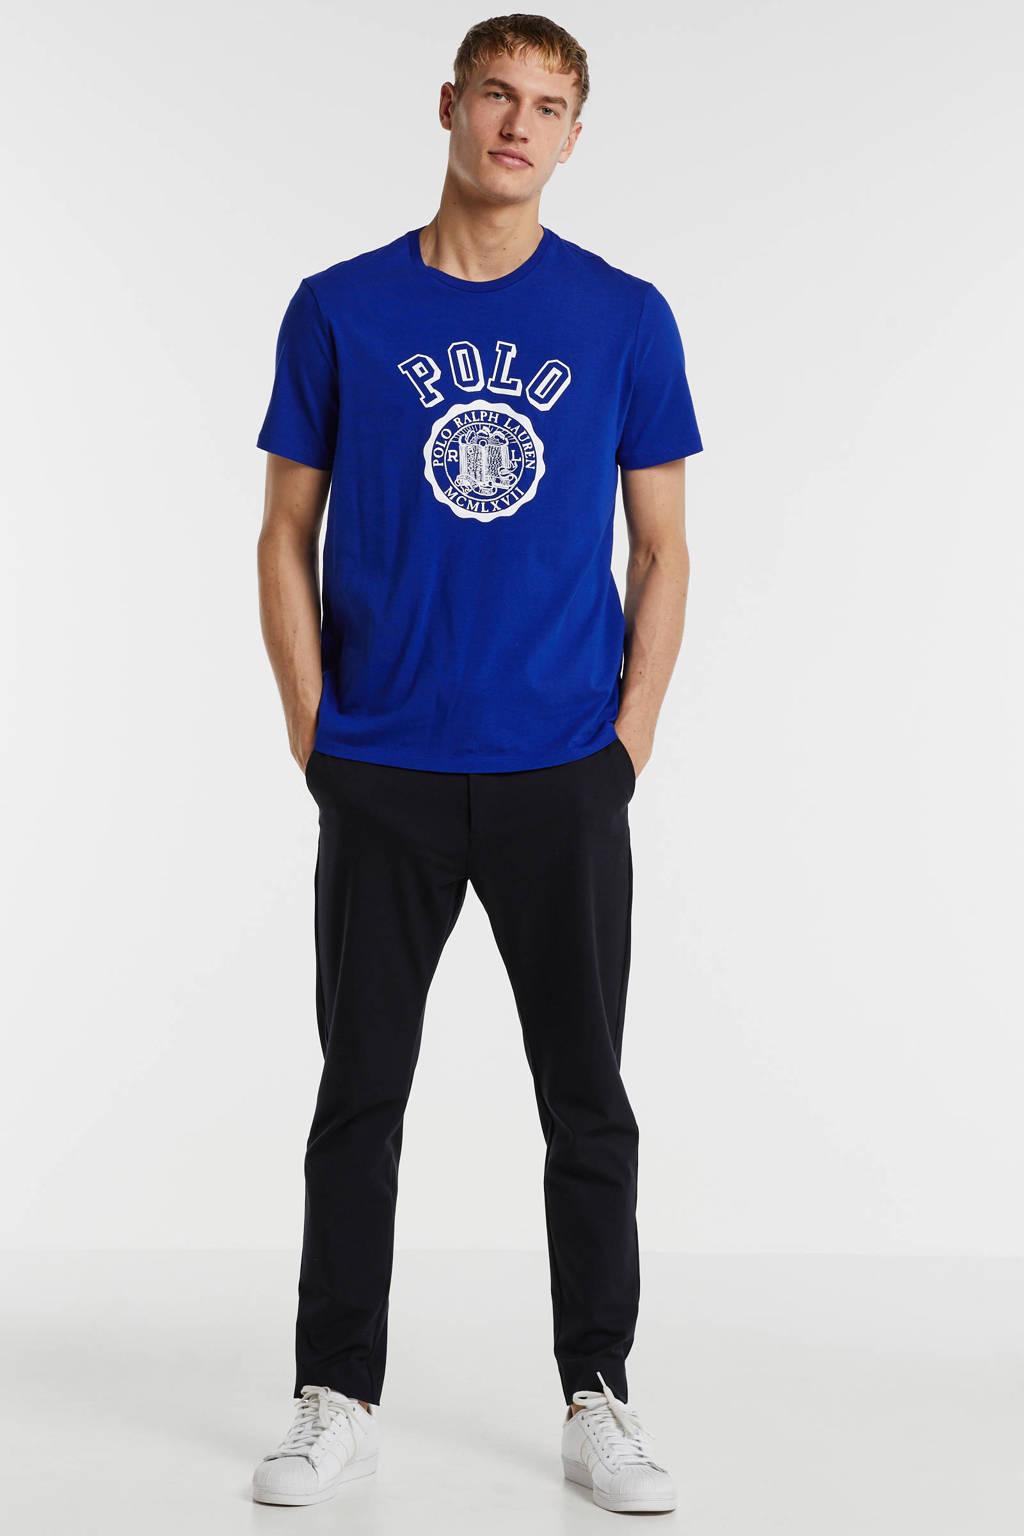 POLO Ralph Lauren T-shirt met printopdruk kobaltblauw, Kobaltblauw